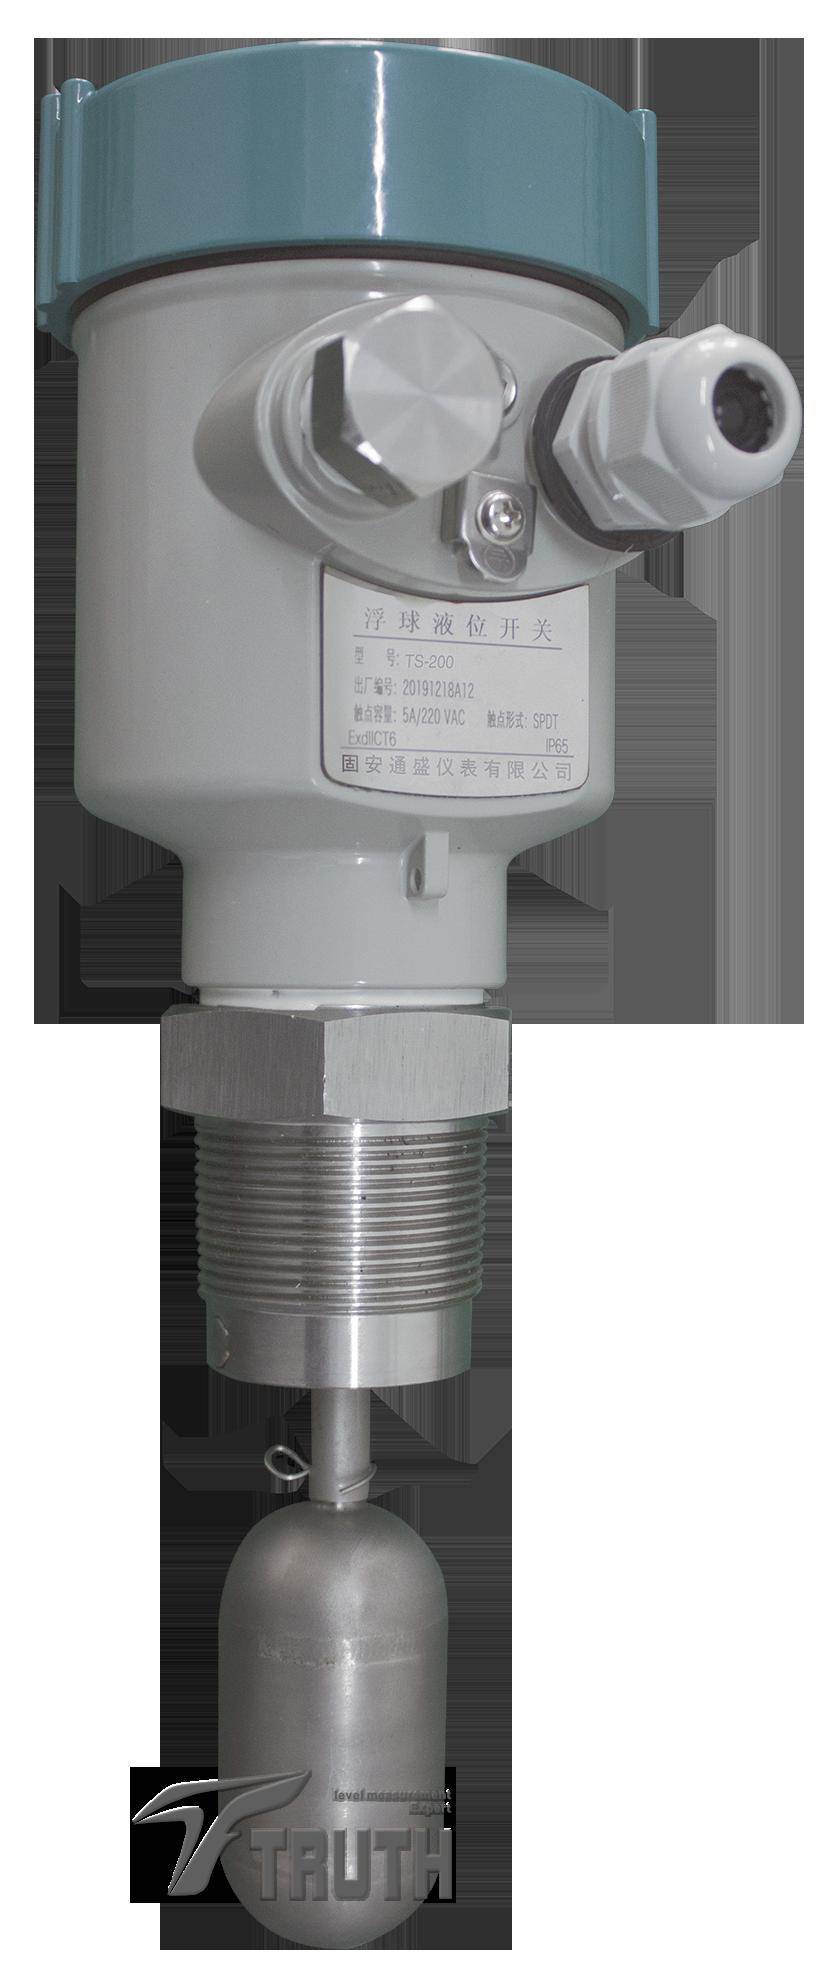 小浮球液位开关TS-200.png